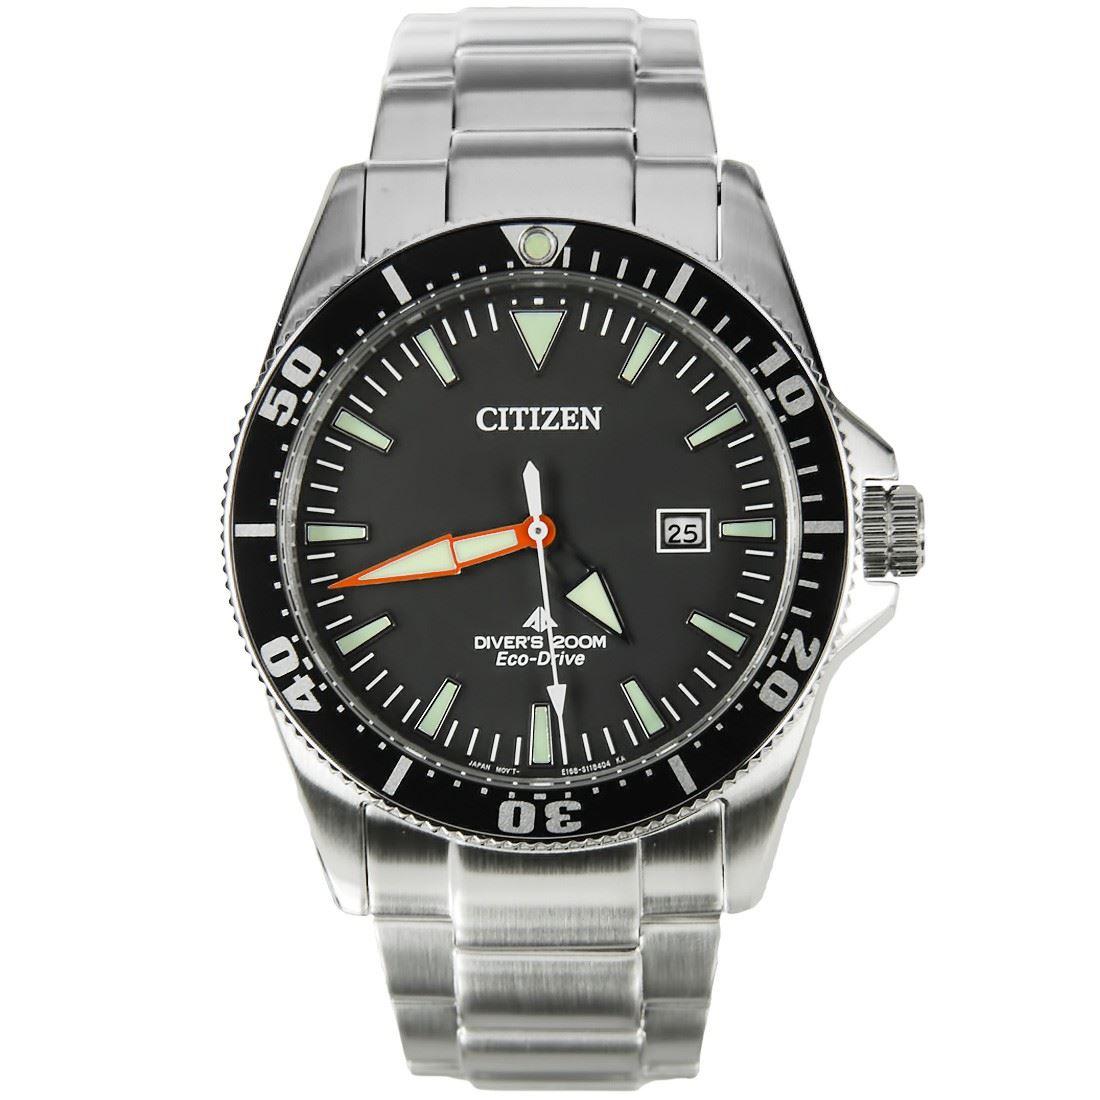 Citizen analog promaster sport mens watch bn0100 00e bn0100 51e ebay - Citizen promaster dive watch ...